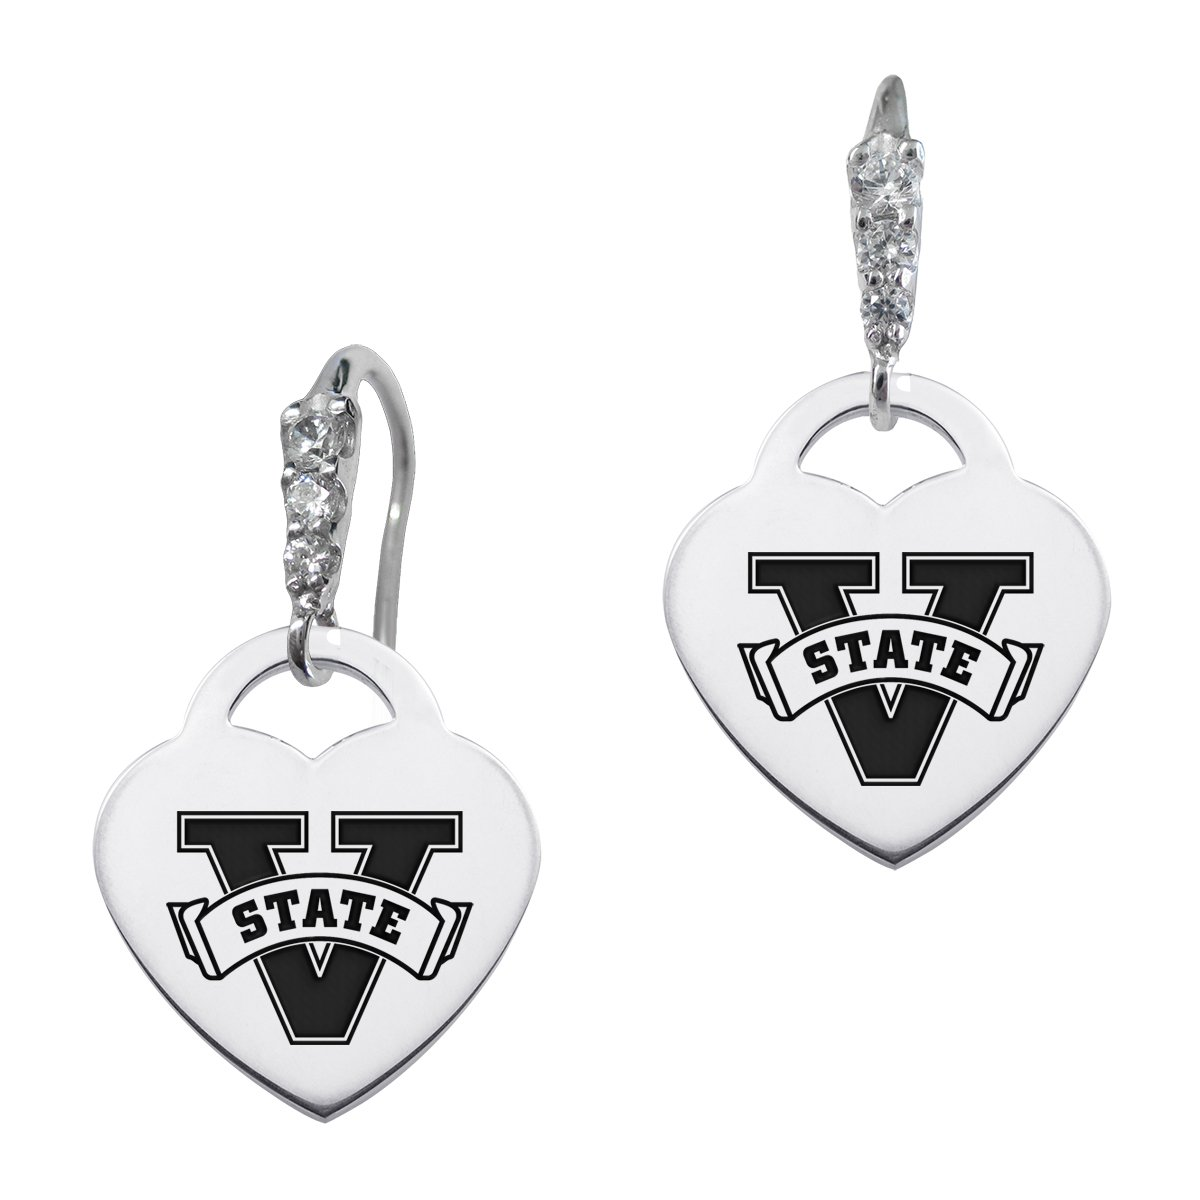 Valdosta State Blazers Cz Cluster Heart Earrings